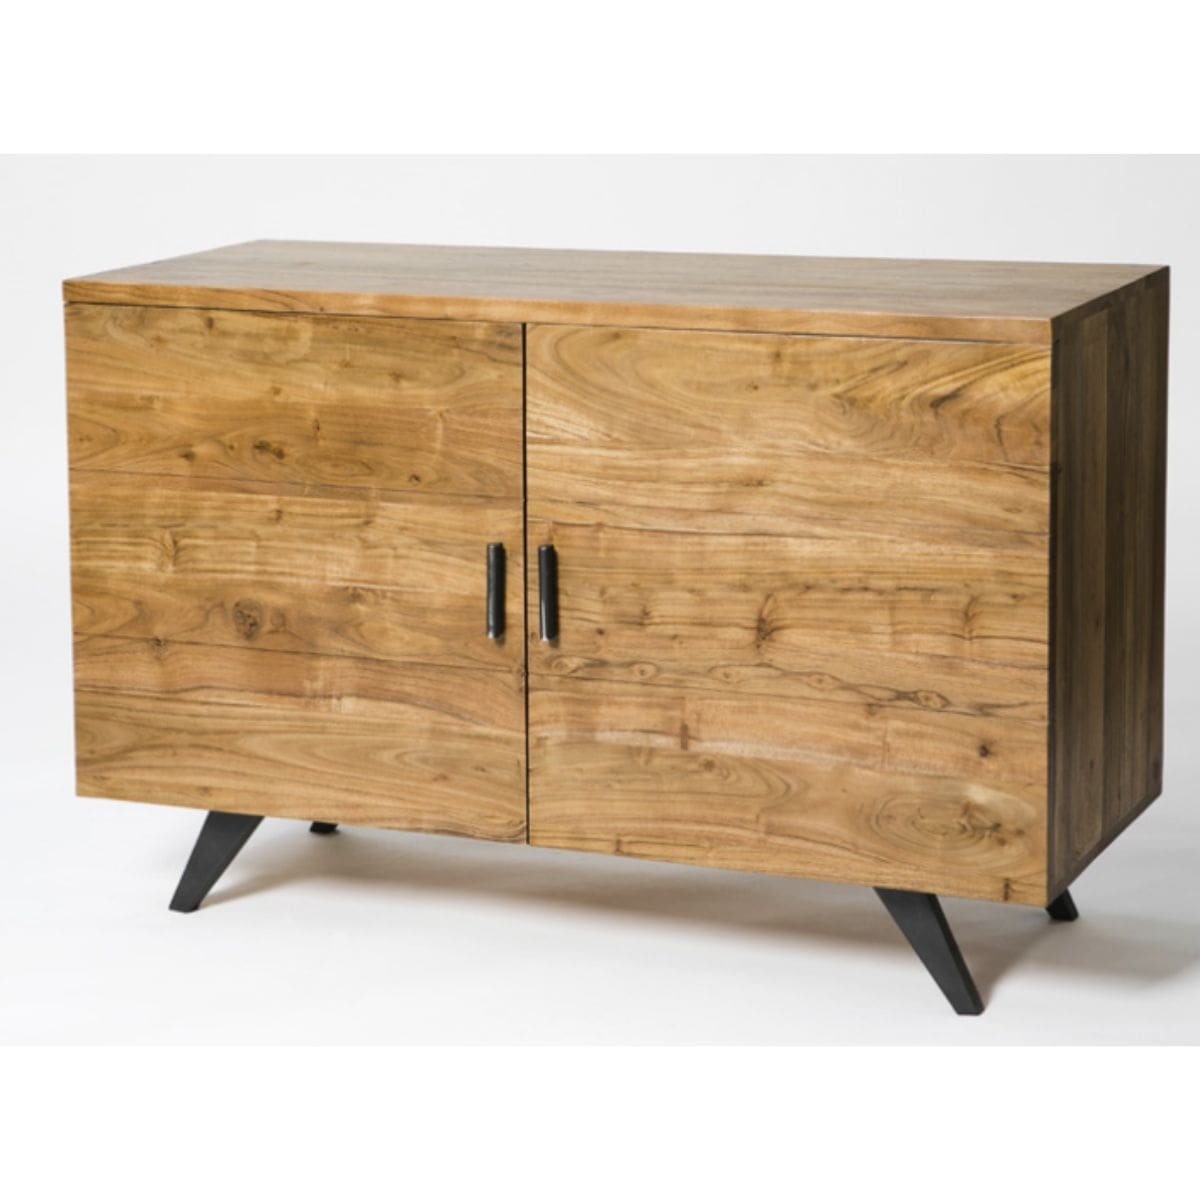 2 door wood and metal sideboard